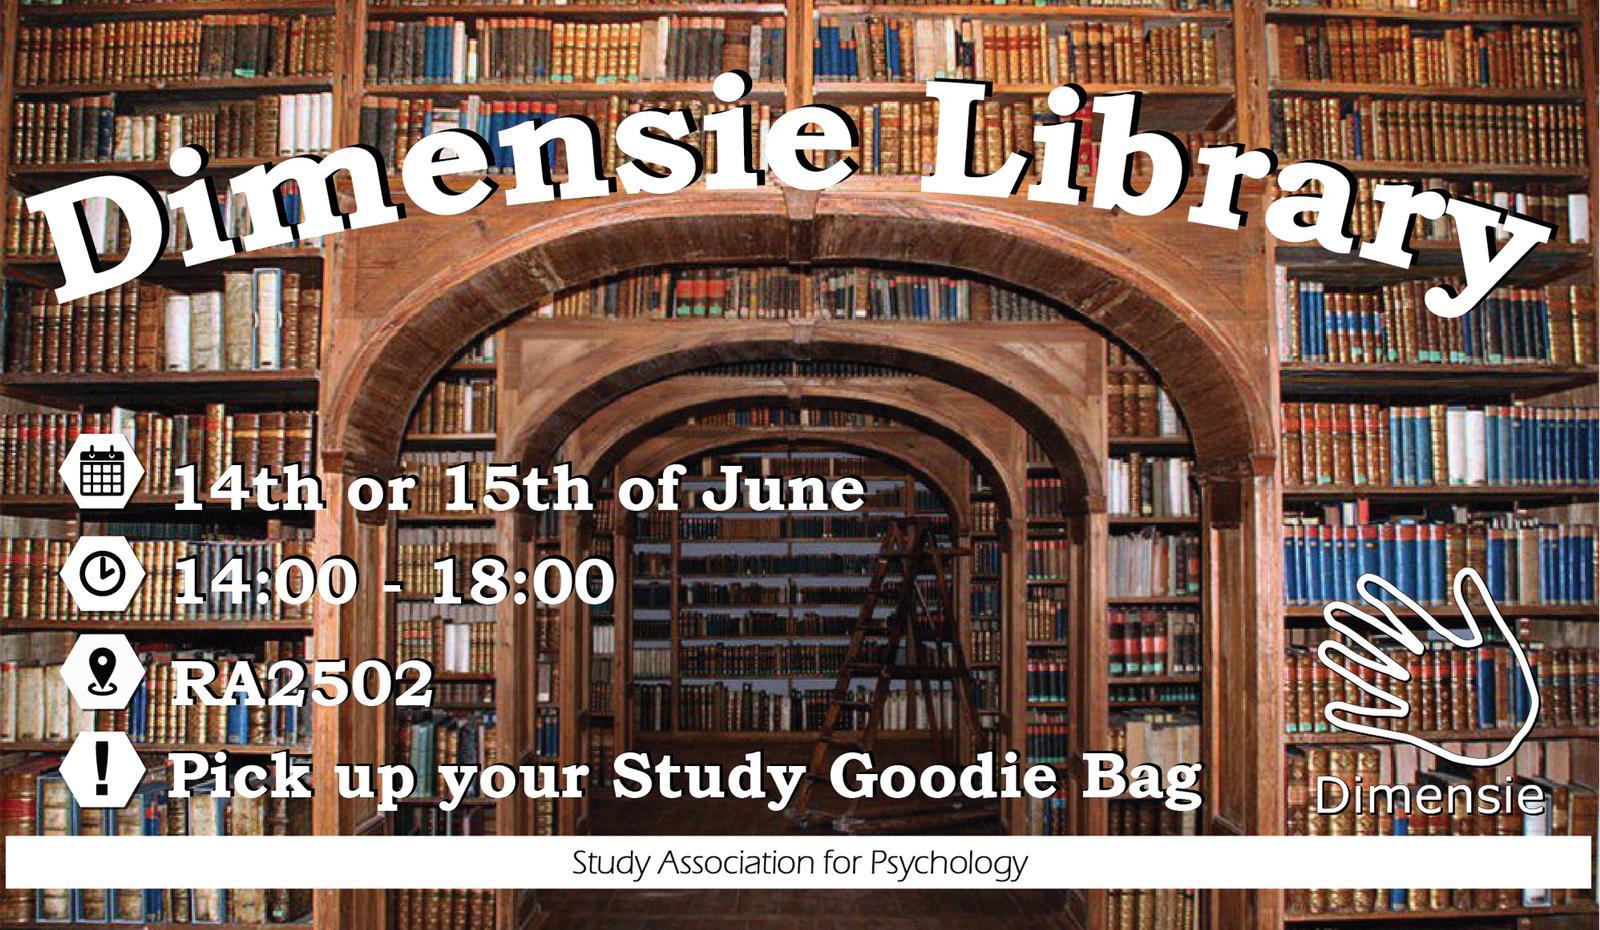 Dimensie Library: Study Afternoon